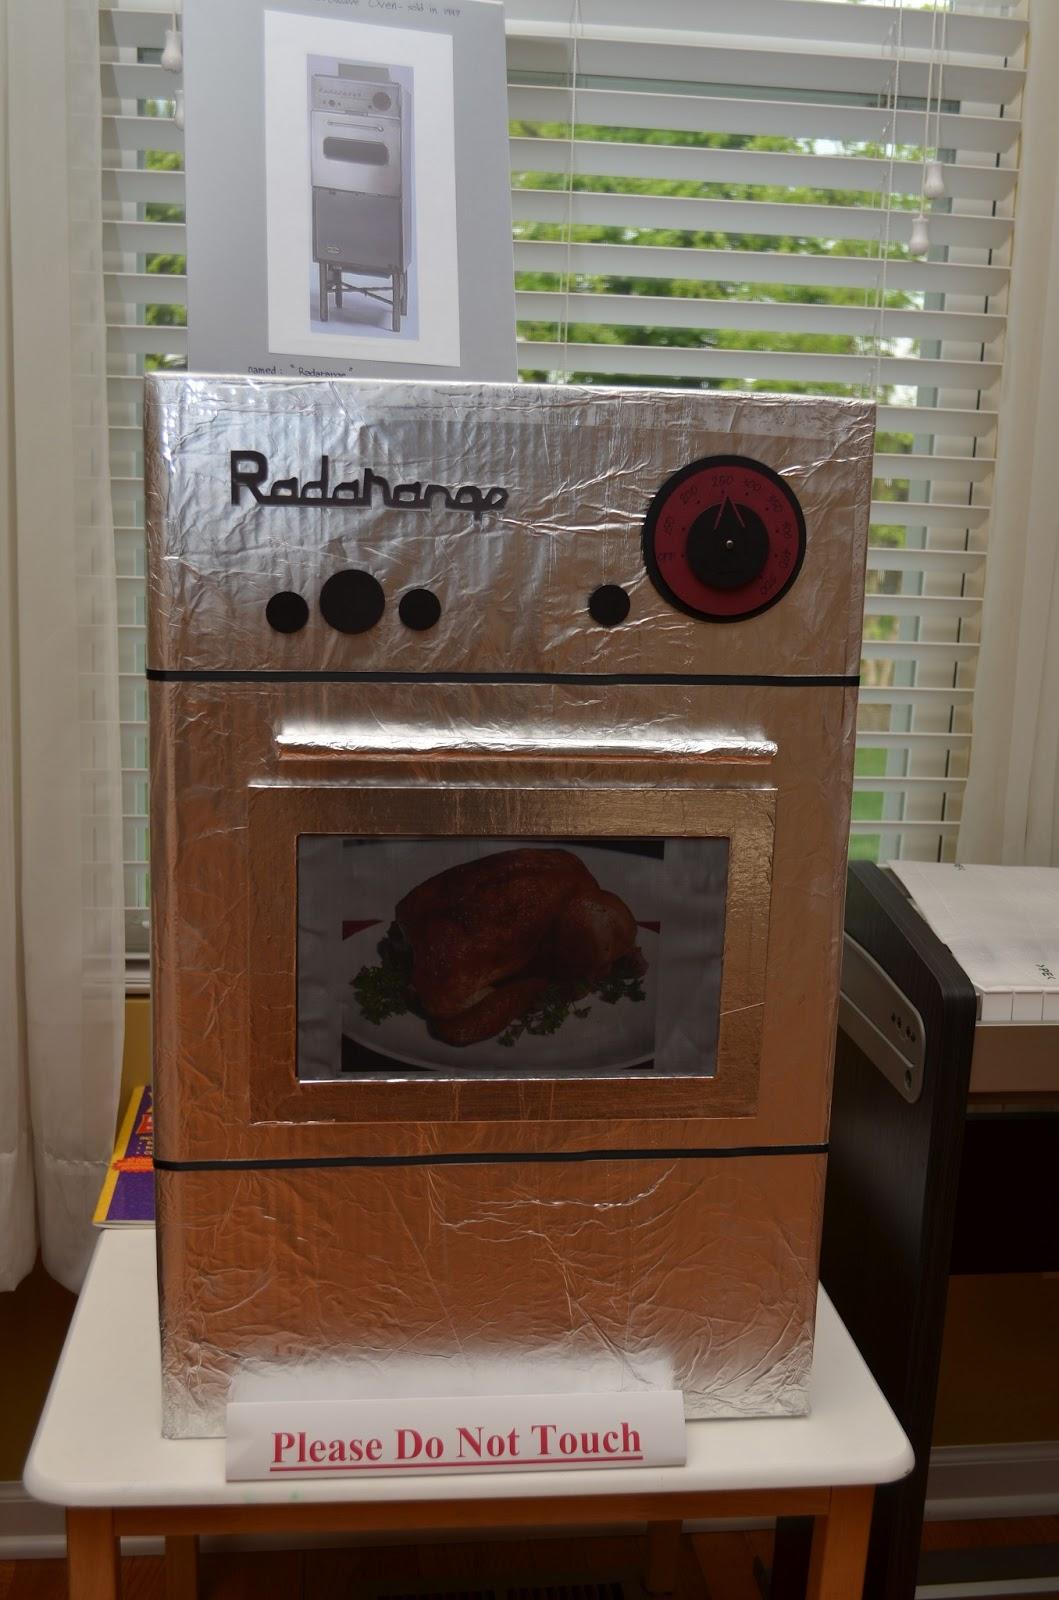 First Microwave Oven ~ Meashie radarange